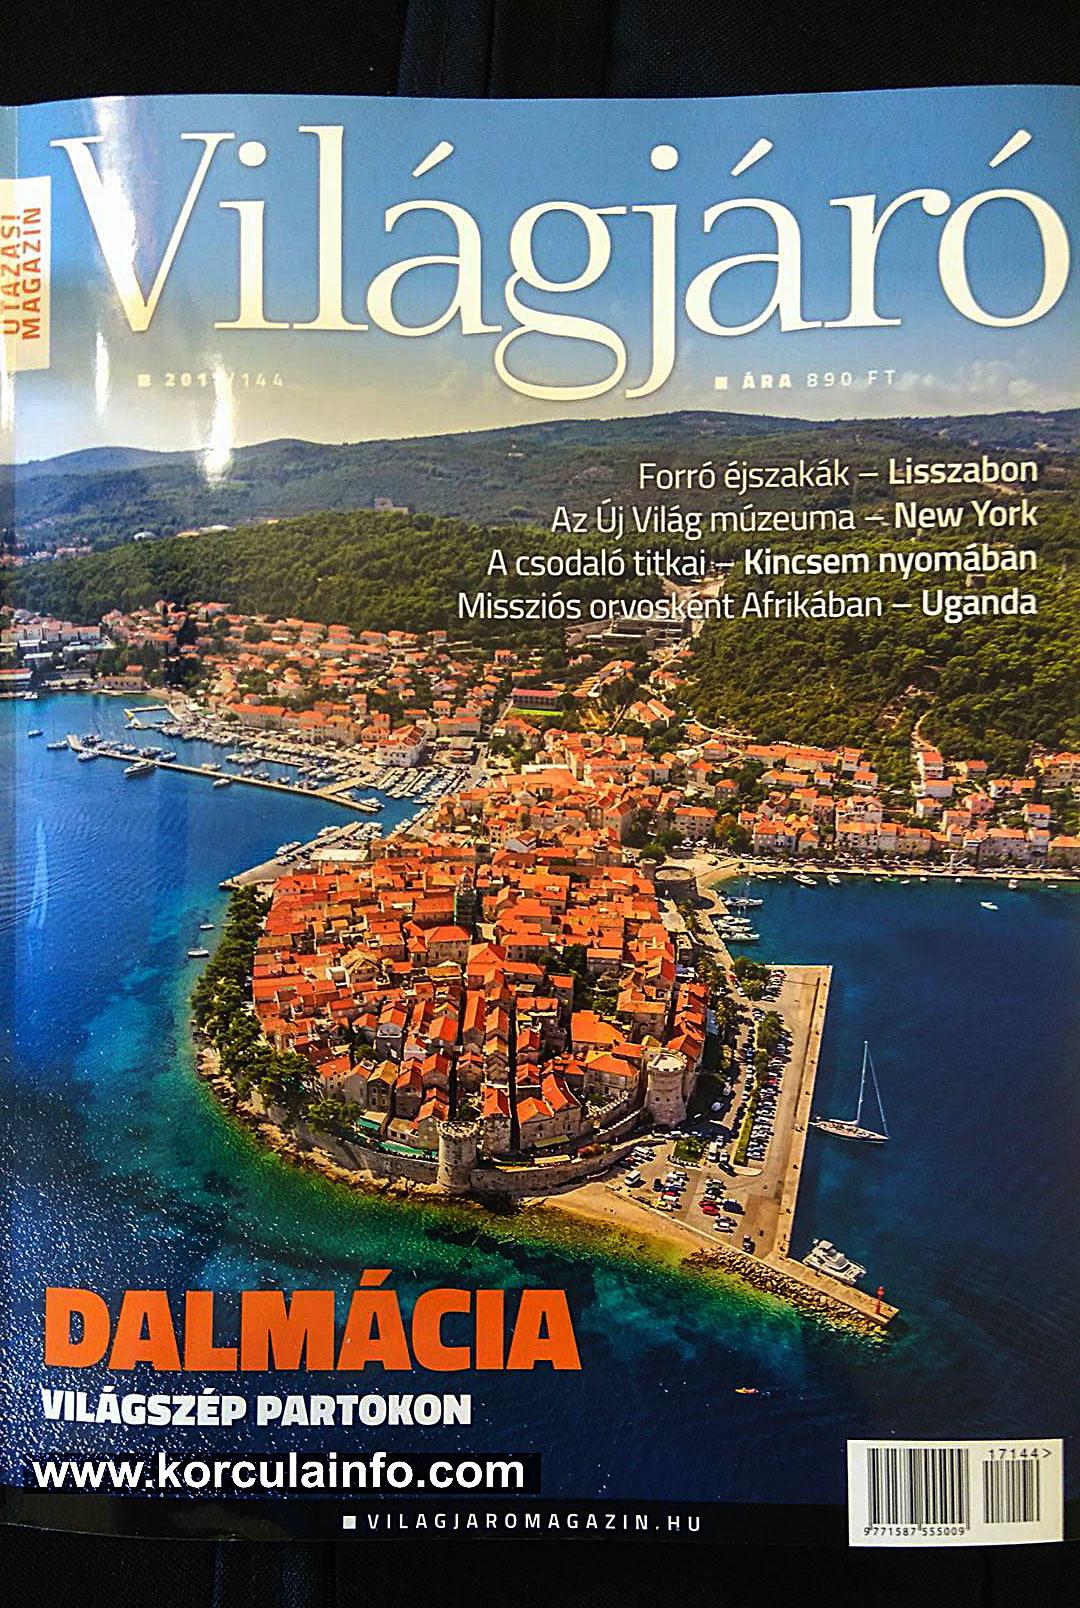 Korcula at the Cover of Vilagjaro Magazine No 144 / July 2017